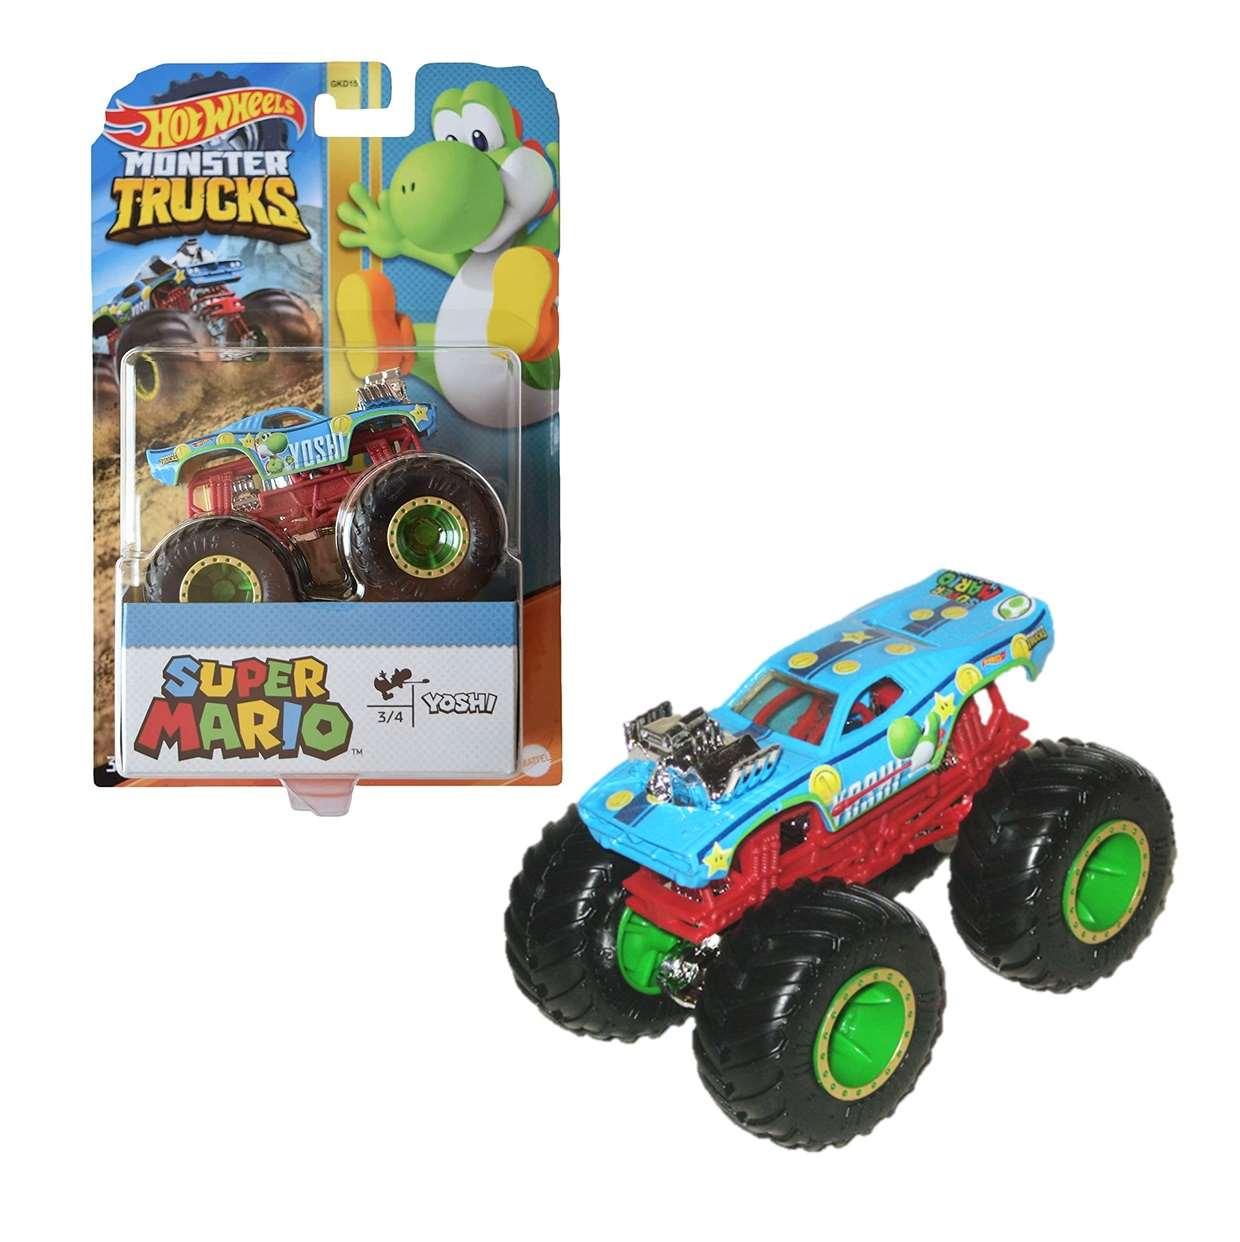 Yoshi Super Mario 3/4 Hot Wheels Monster Trucks